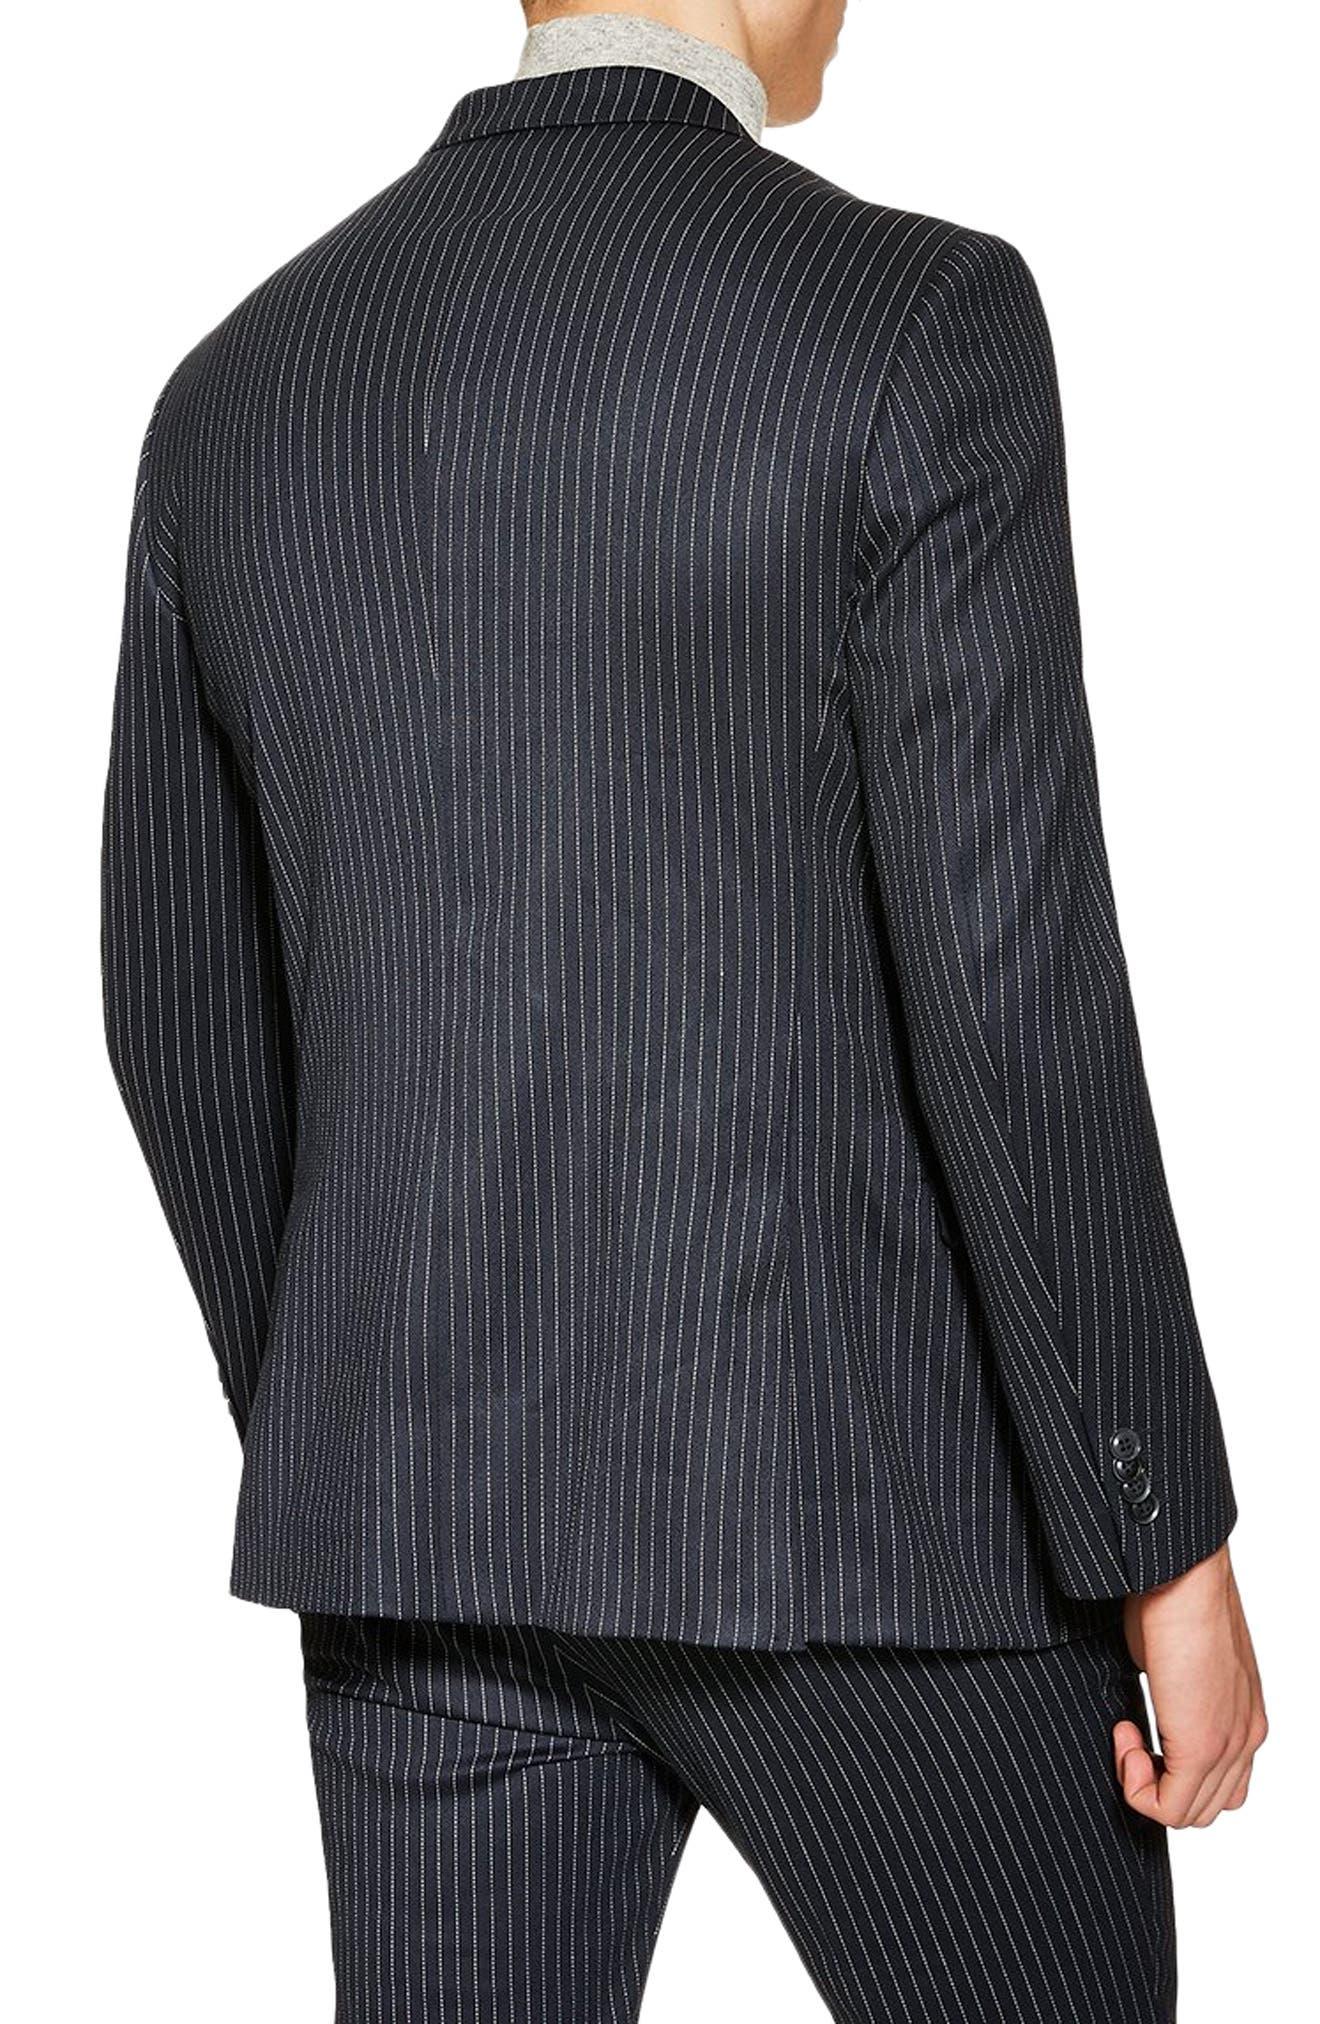 Tailored Pinstripe Suit Jacket,                             Alternate thumbnail 2, color,                             NAVY BLUE